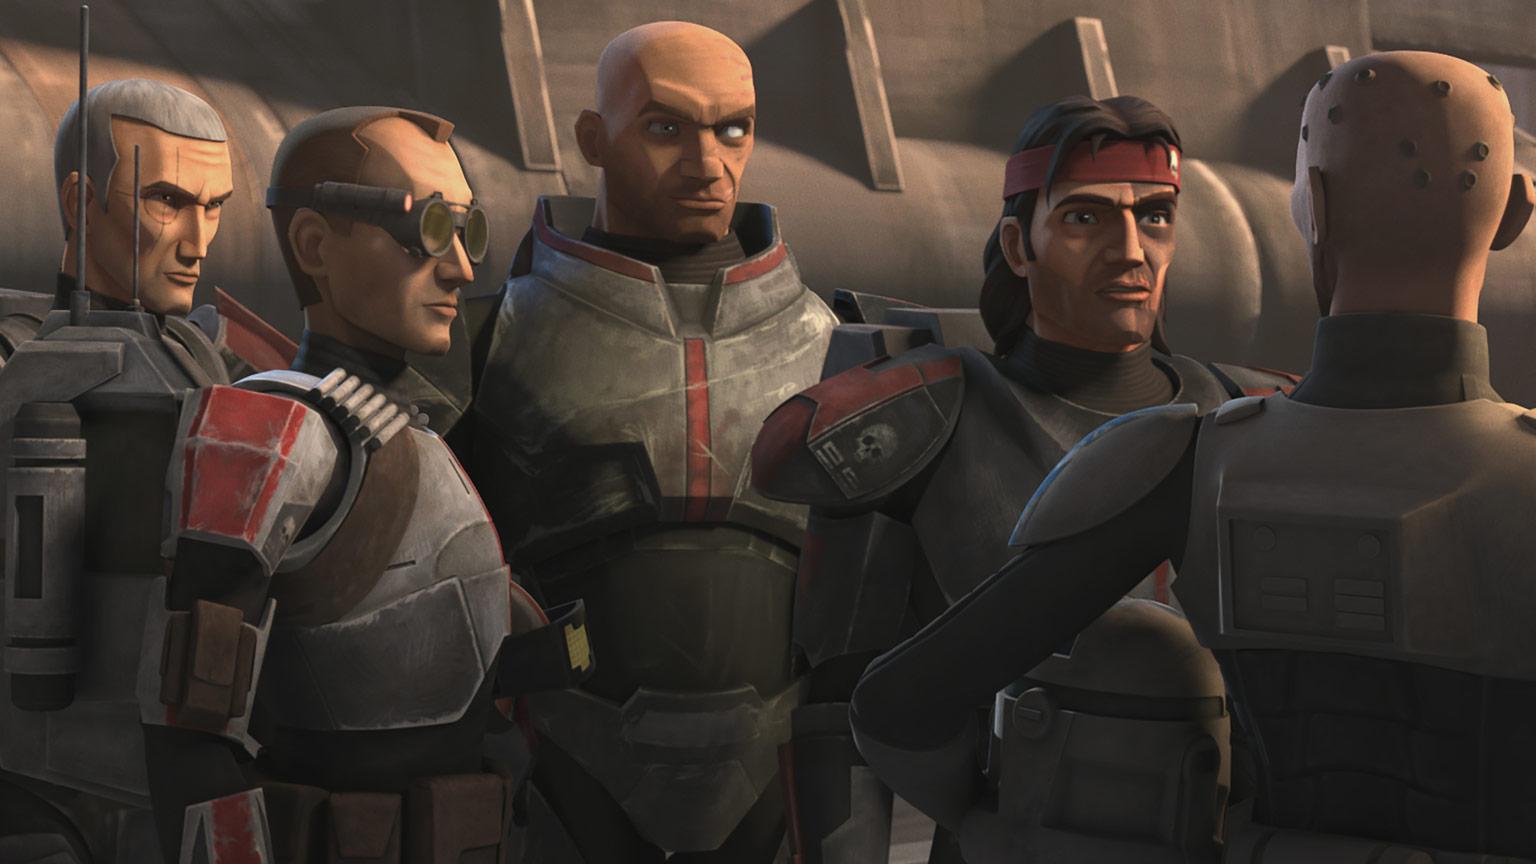 Disney divulga novo teaser de Star Wars: The Bad Batch